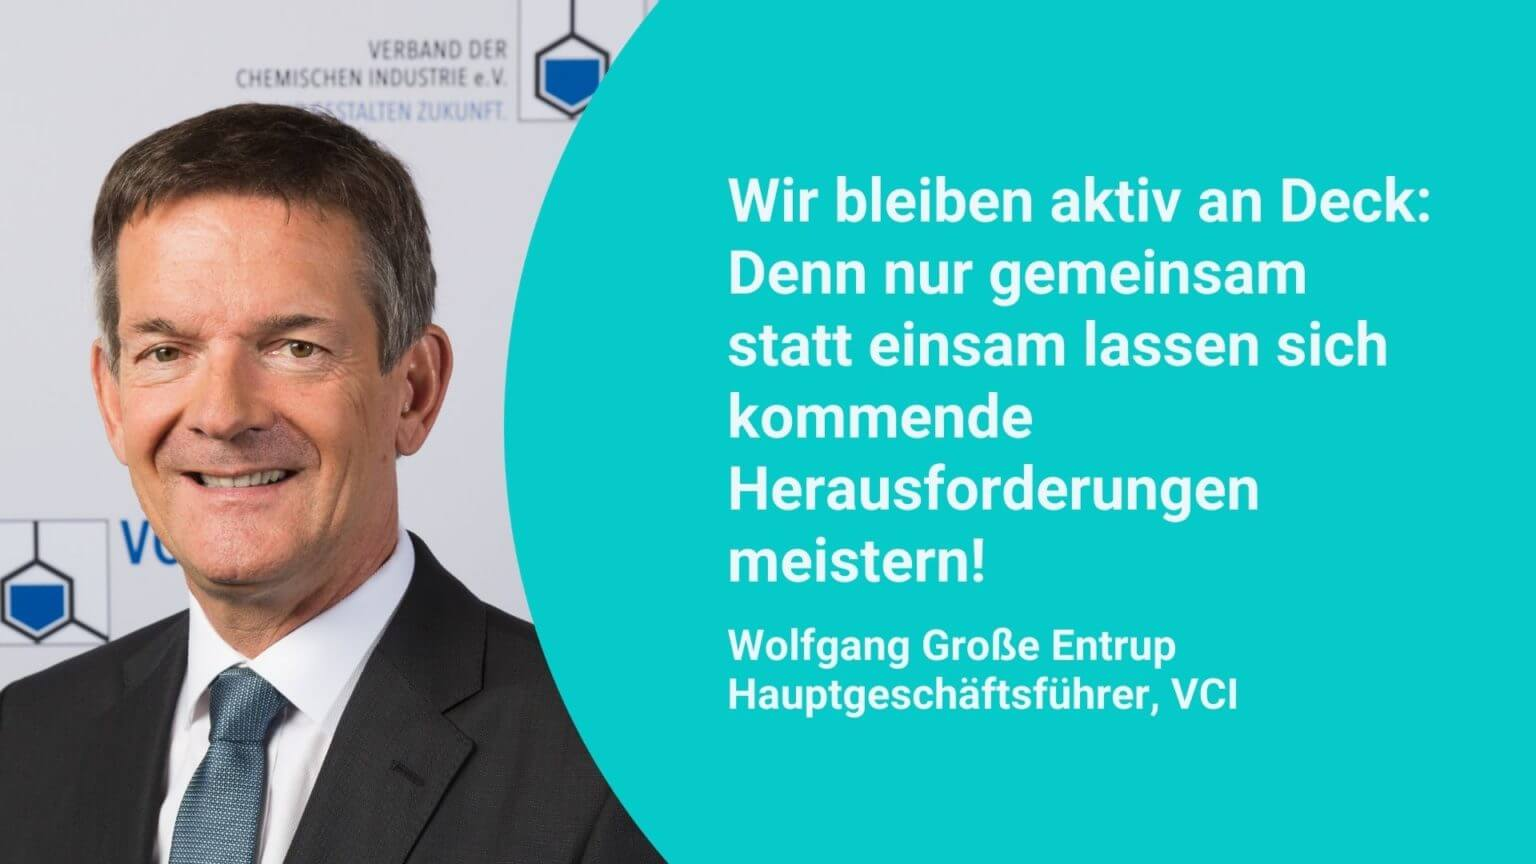 Grosse-Entrup_Wolfgang_VCI-1536x864